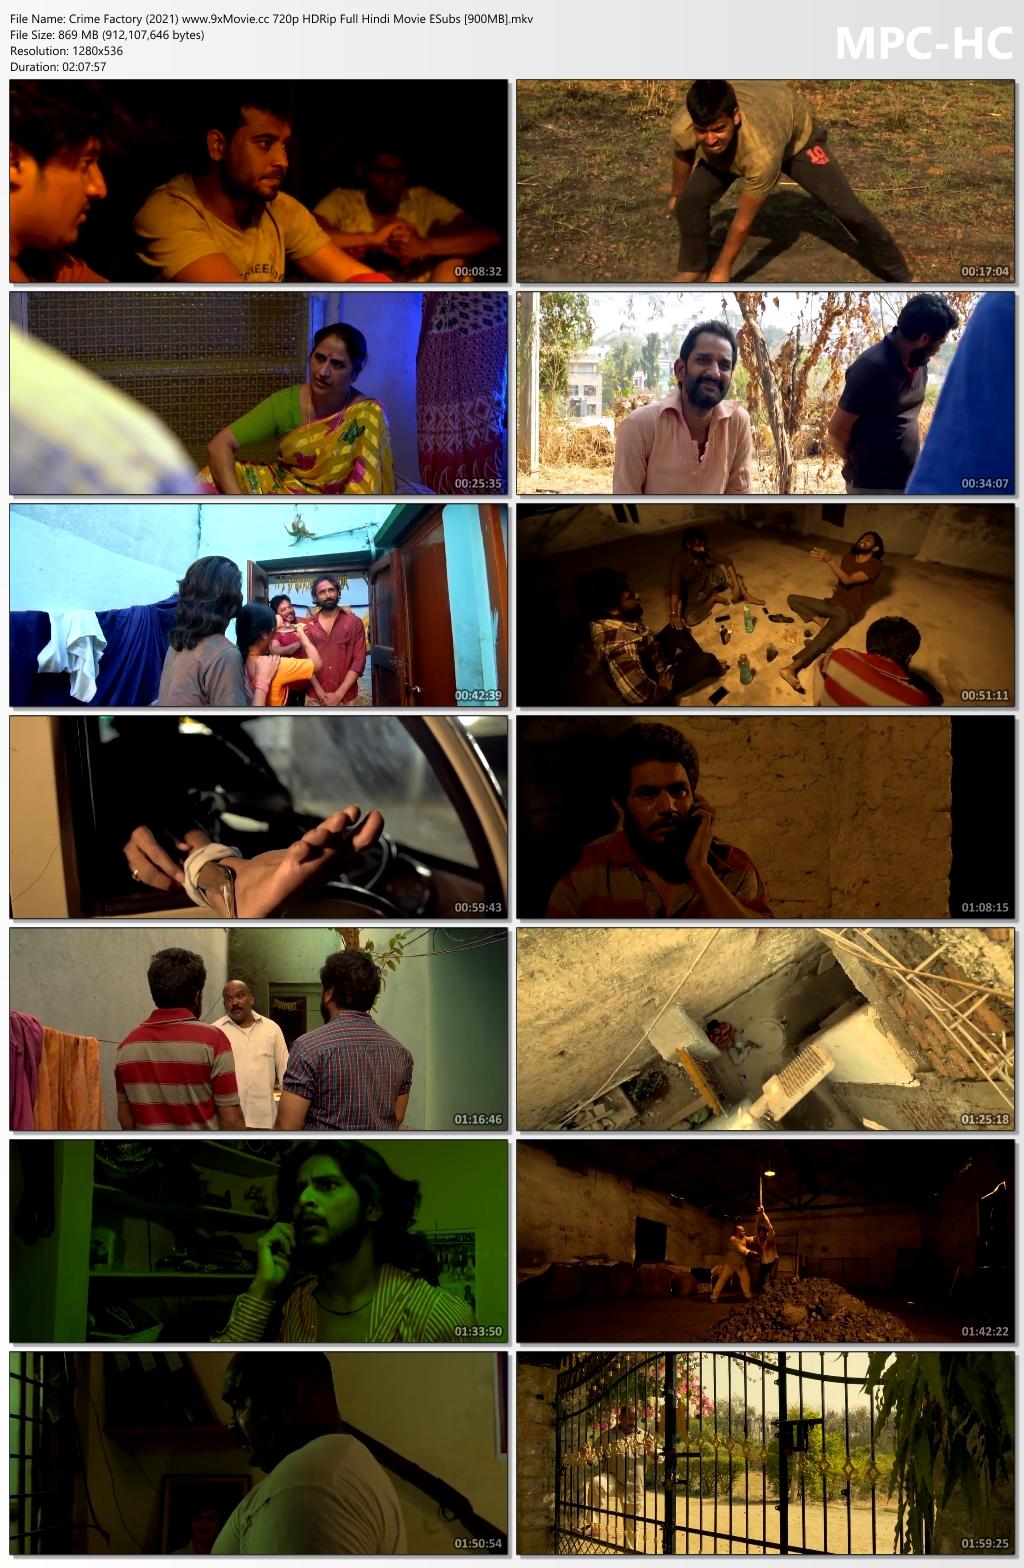 Crime-Factory-2021-www-9x-Movie-cc-720p-HDRip-Full-Hindi-Movie-ESubs-900-MB-mkv